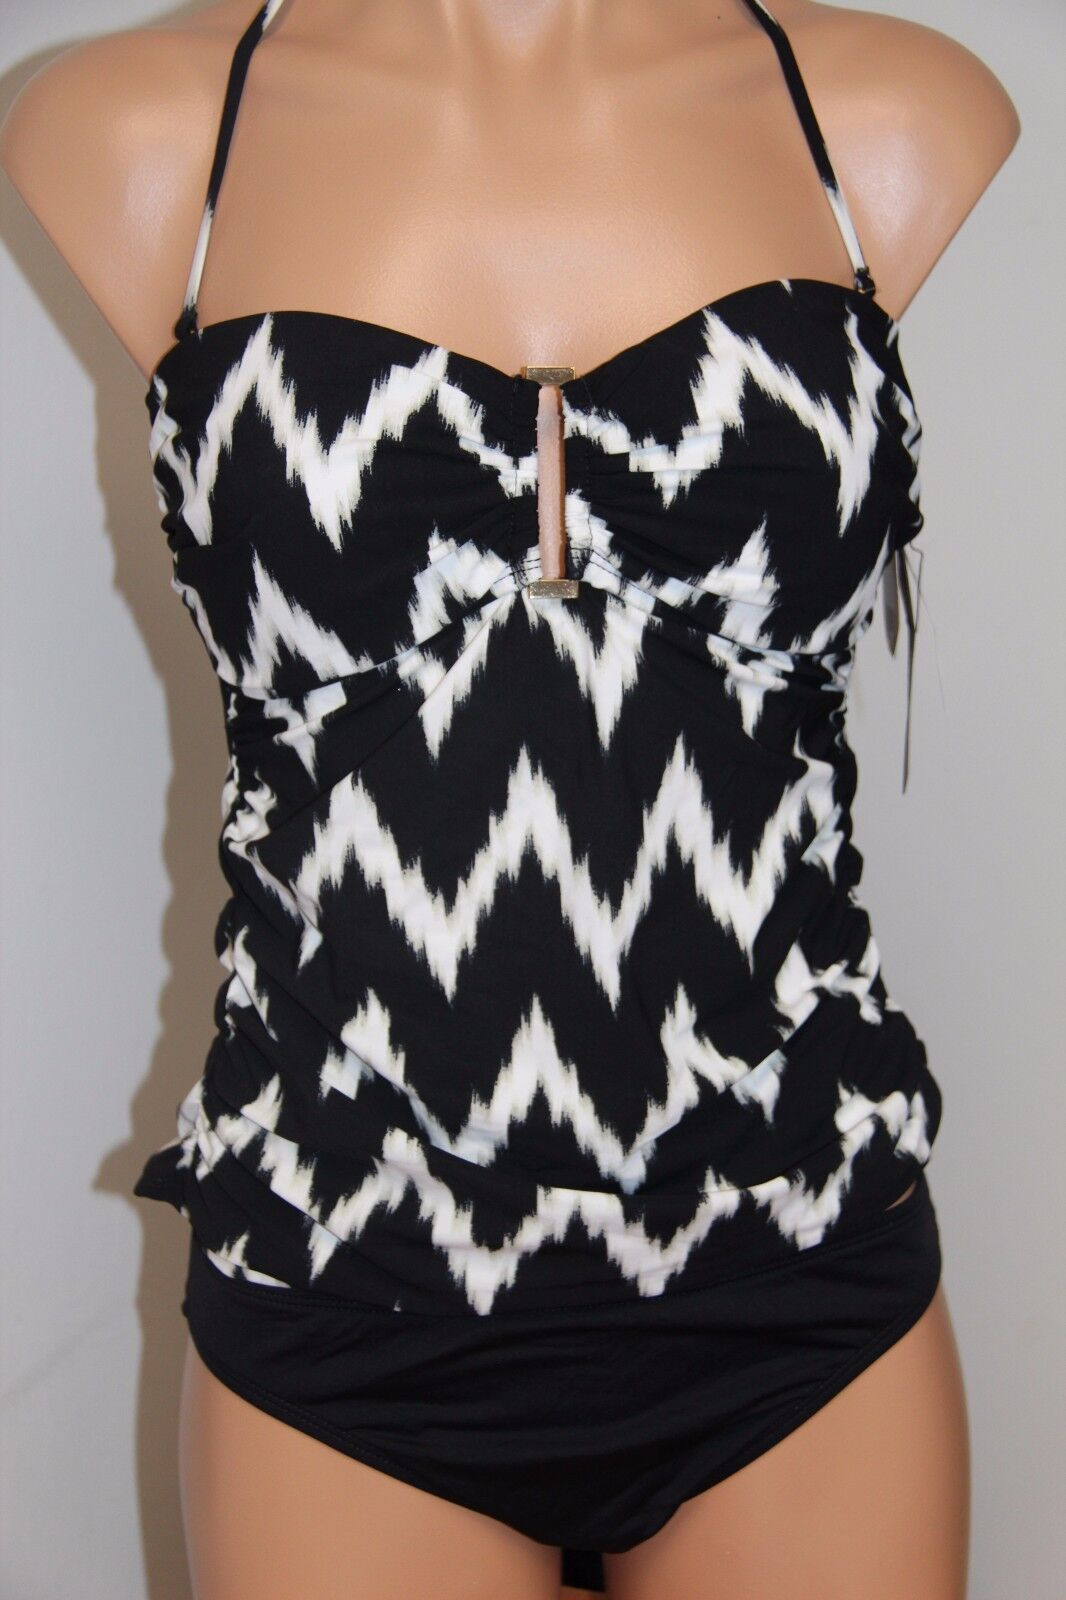 New La whitea Swimsuit Bikini Tankini 2 pc set Sz 6 BLK White Bassic Bandeau